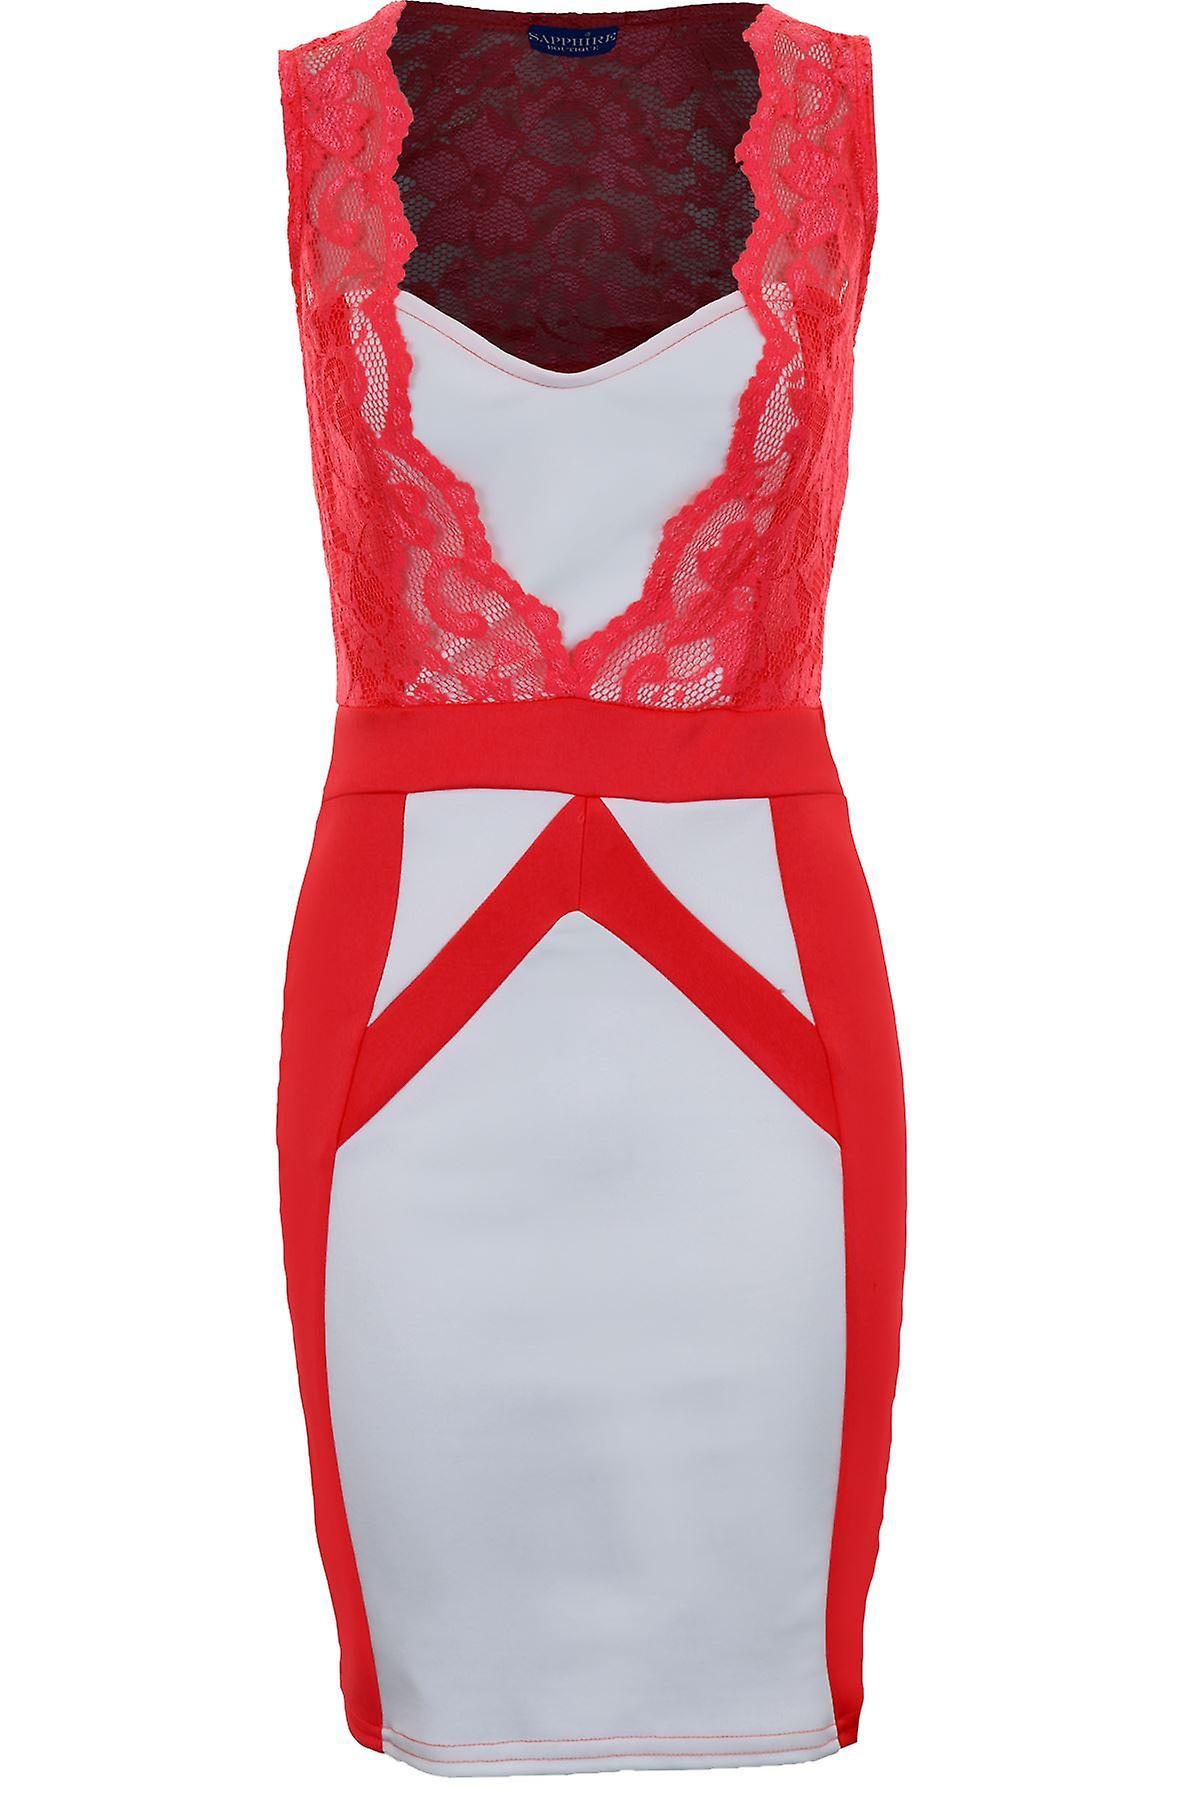 Ladies Sleeveless Square Neck Lace Contrast Panel Women's Bodycon Dress